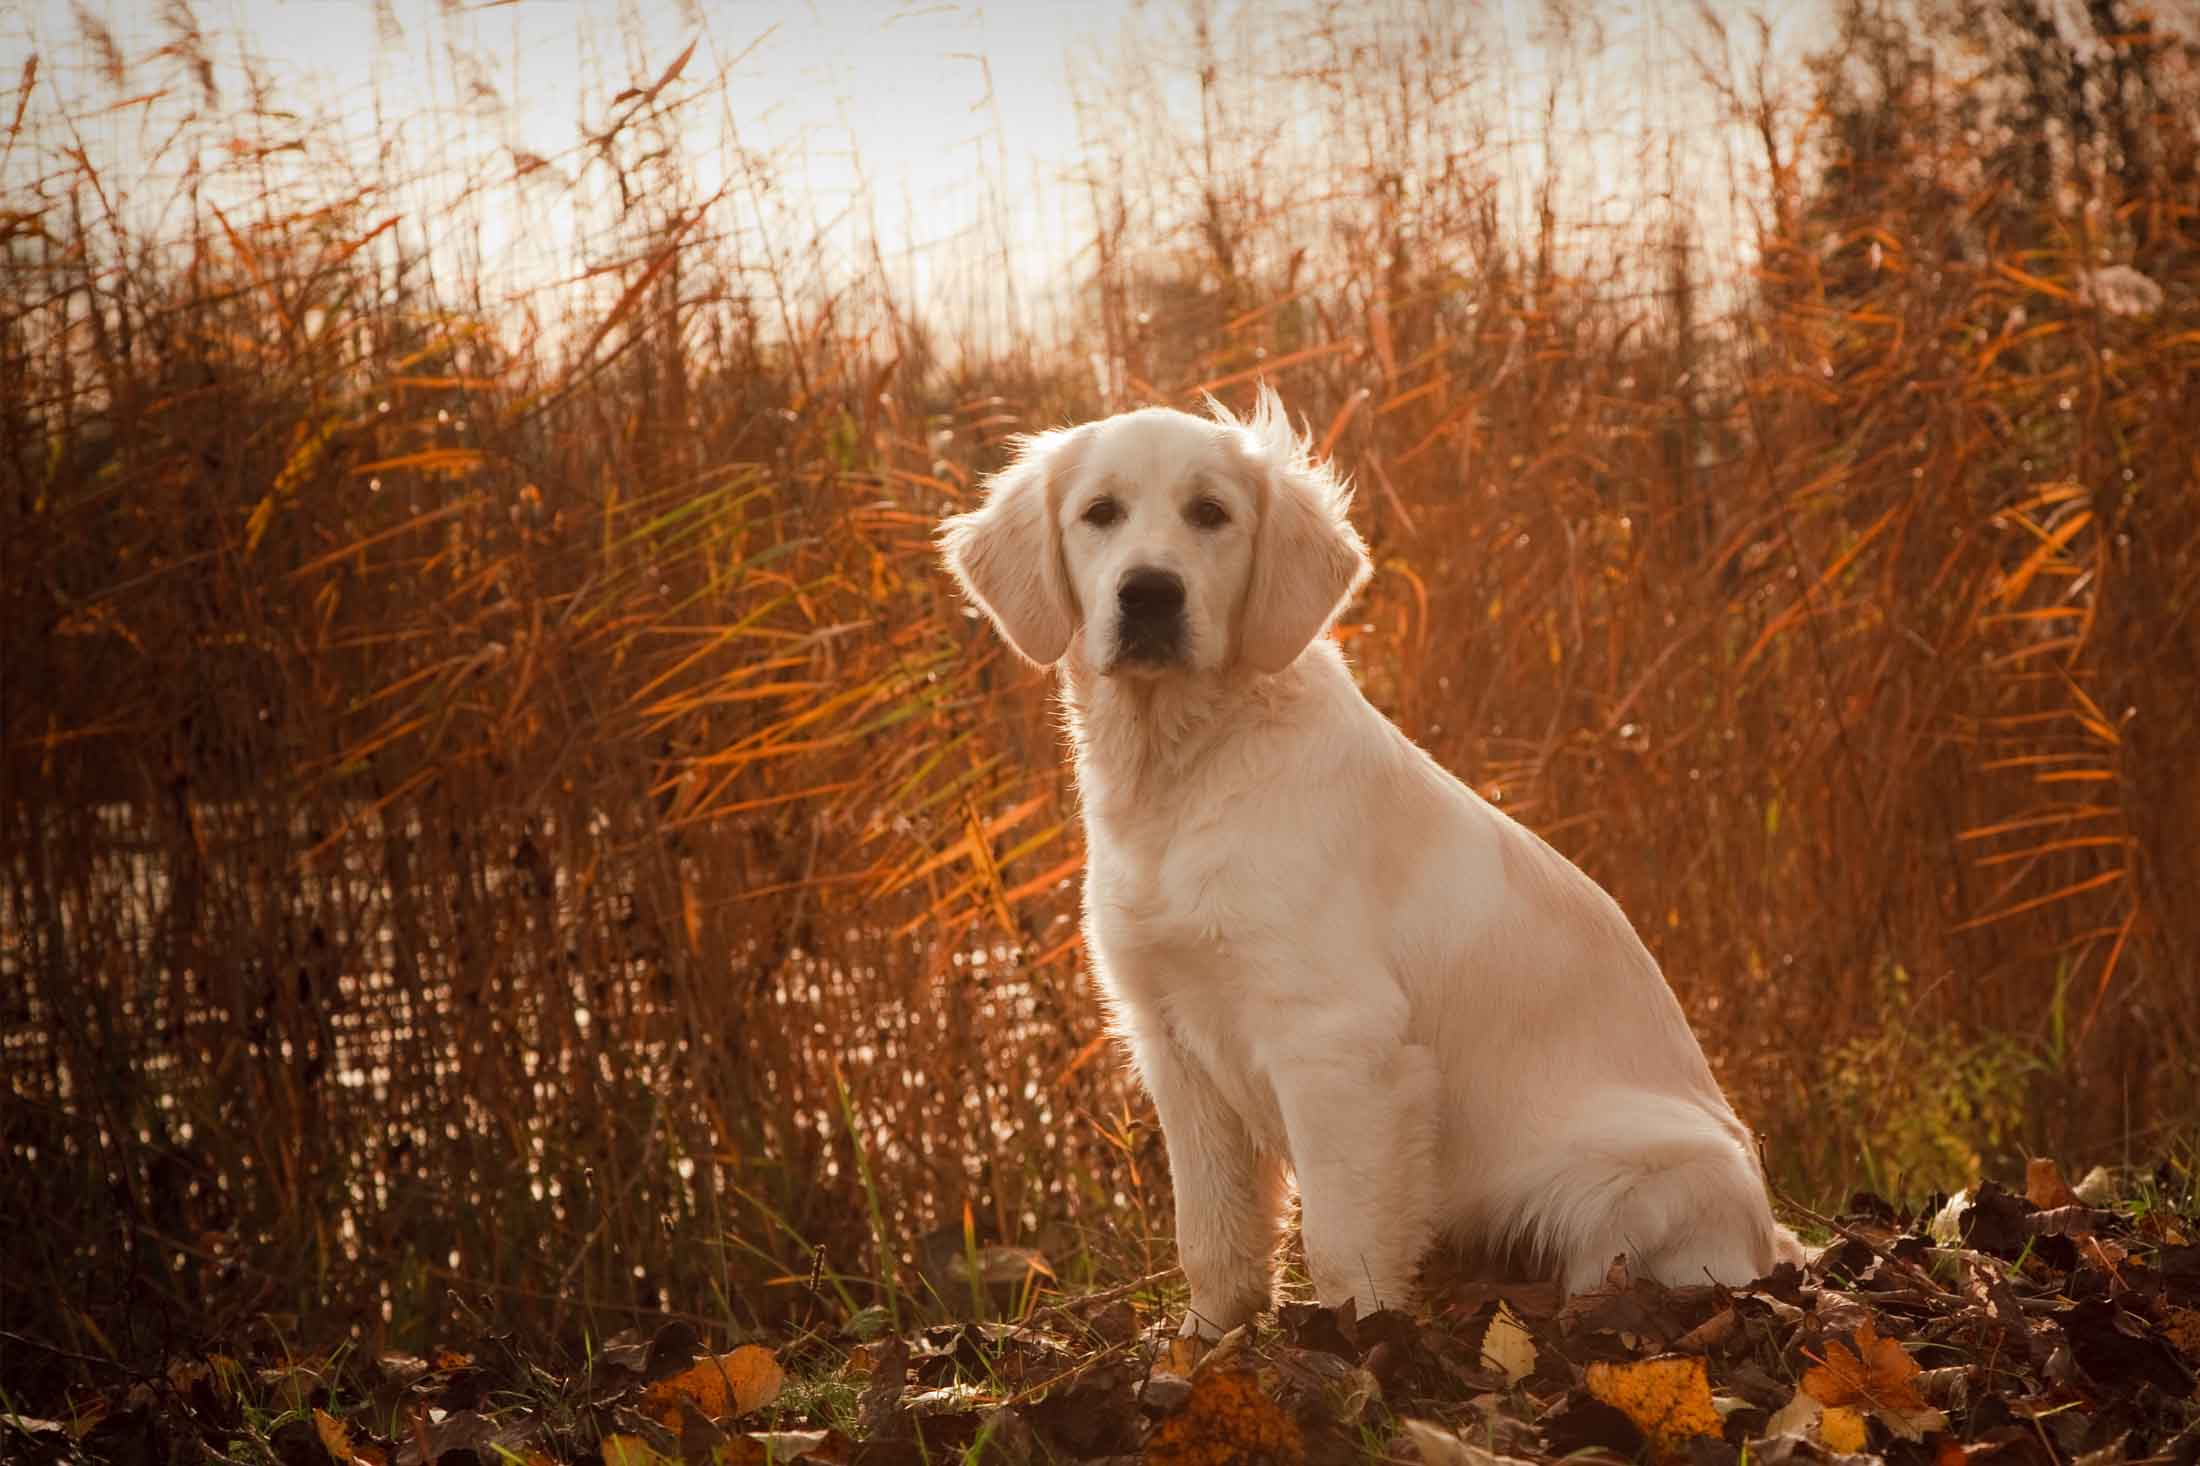 Anjing Golden : Karakter, Variasi Jenis, kelebihan & Harga (Update) 2